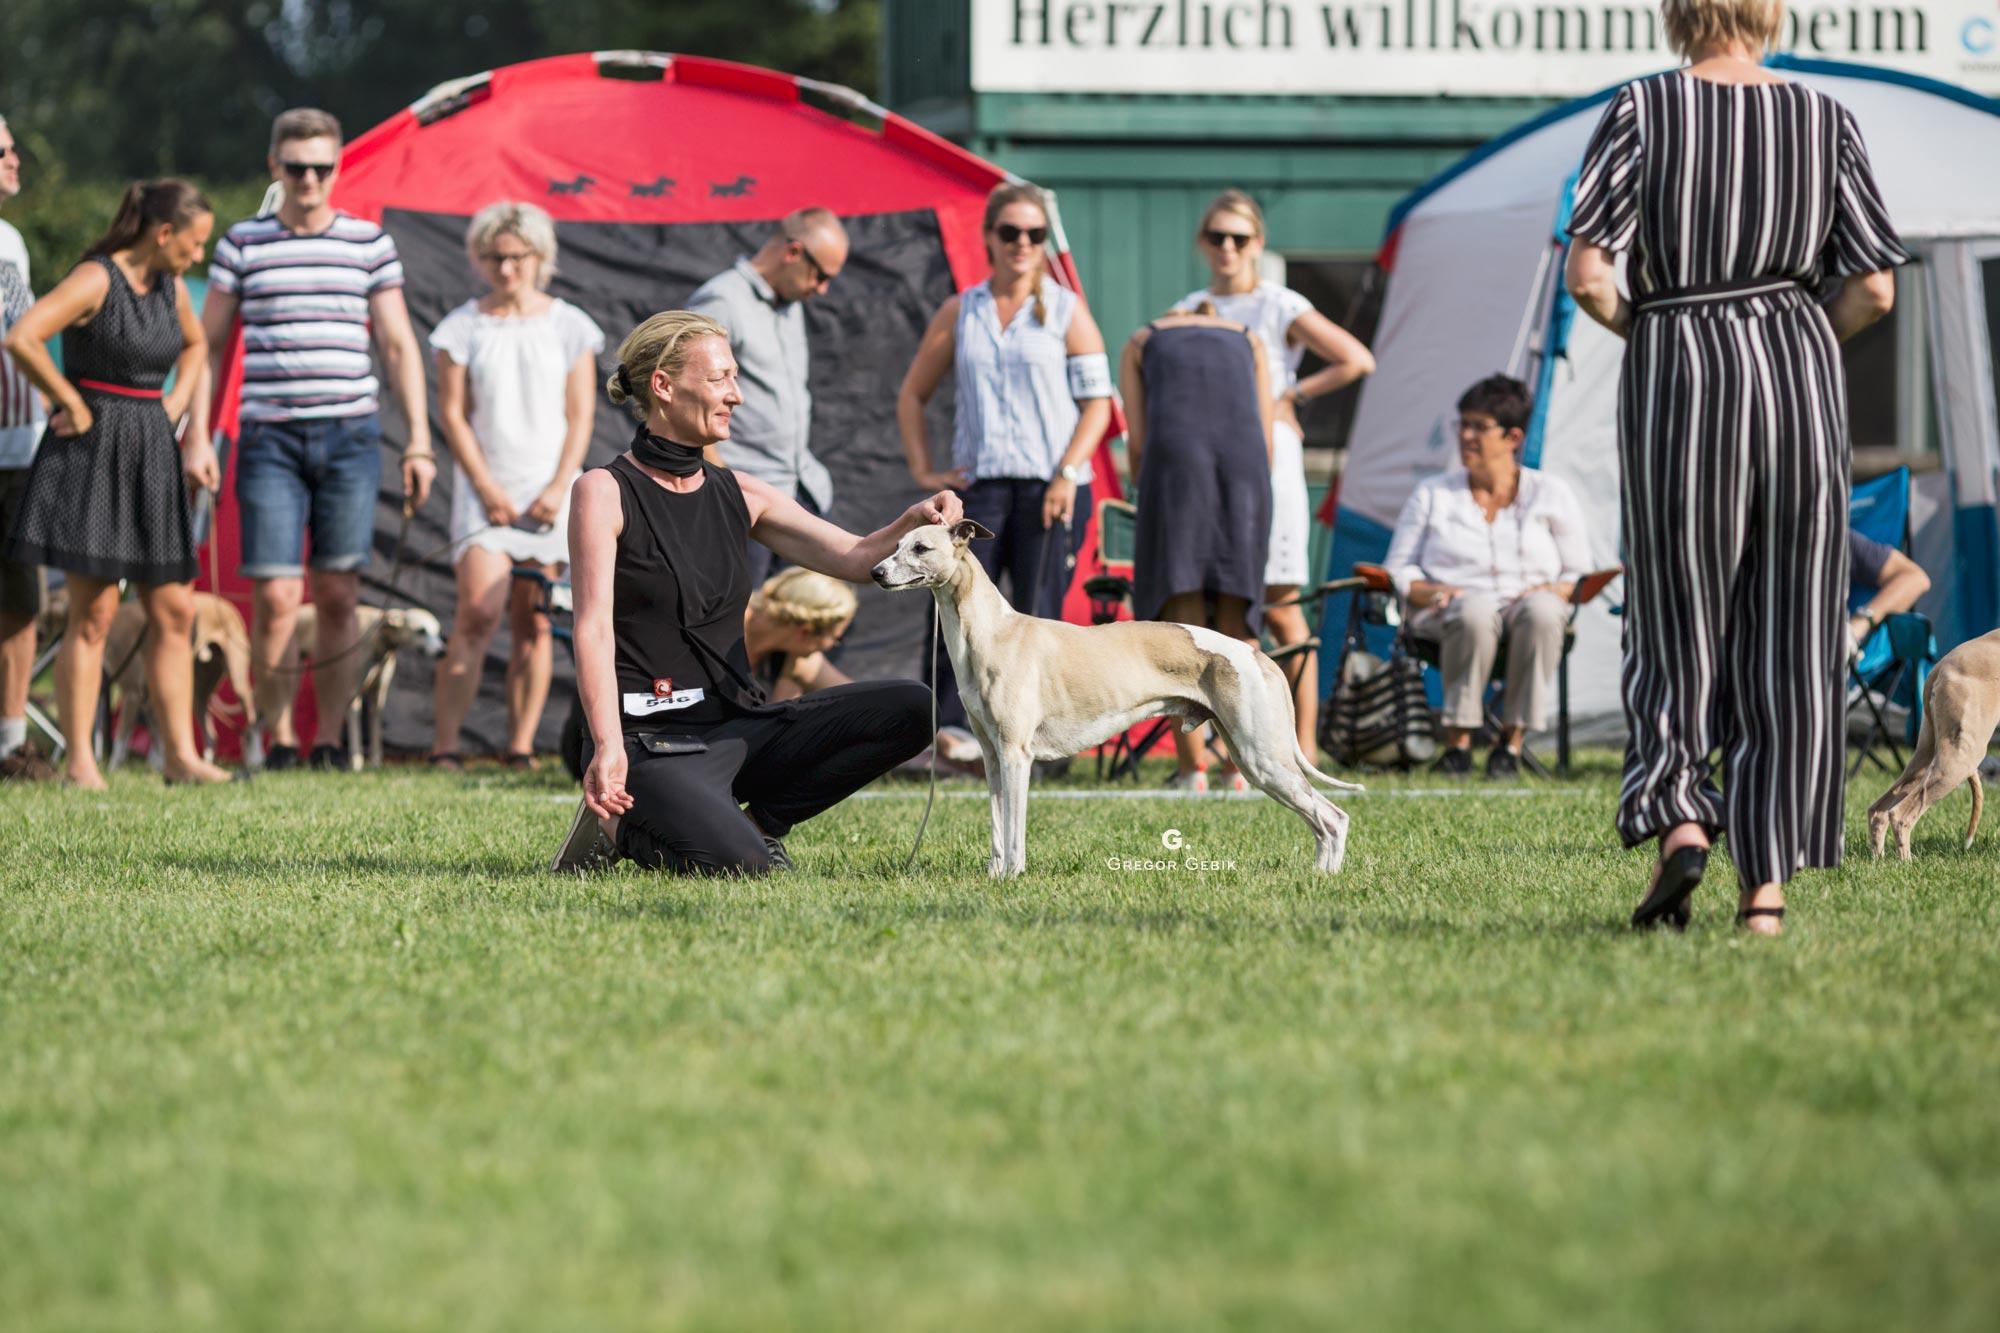 Veteran Winner Donaueschingen 2018 - Mono, Conte del Aqua semper-crescendo beim Sighthound Festival Donaueschingen 2018, Richterin: Pauline Oliver /GB, Foto: Grzegorz Gebik 2018